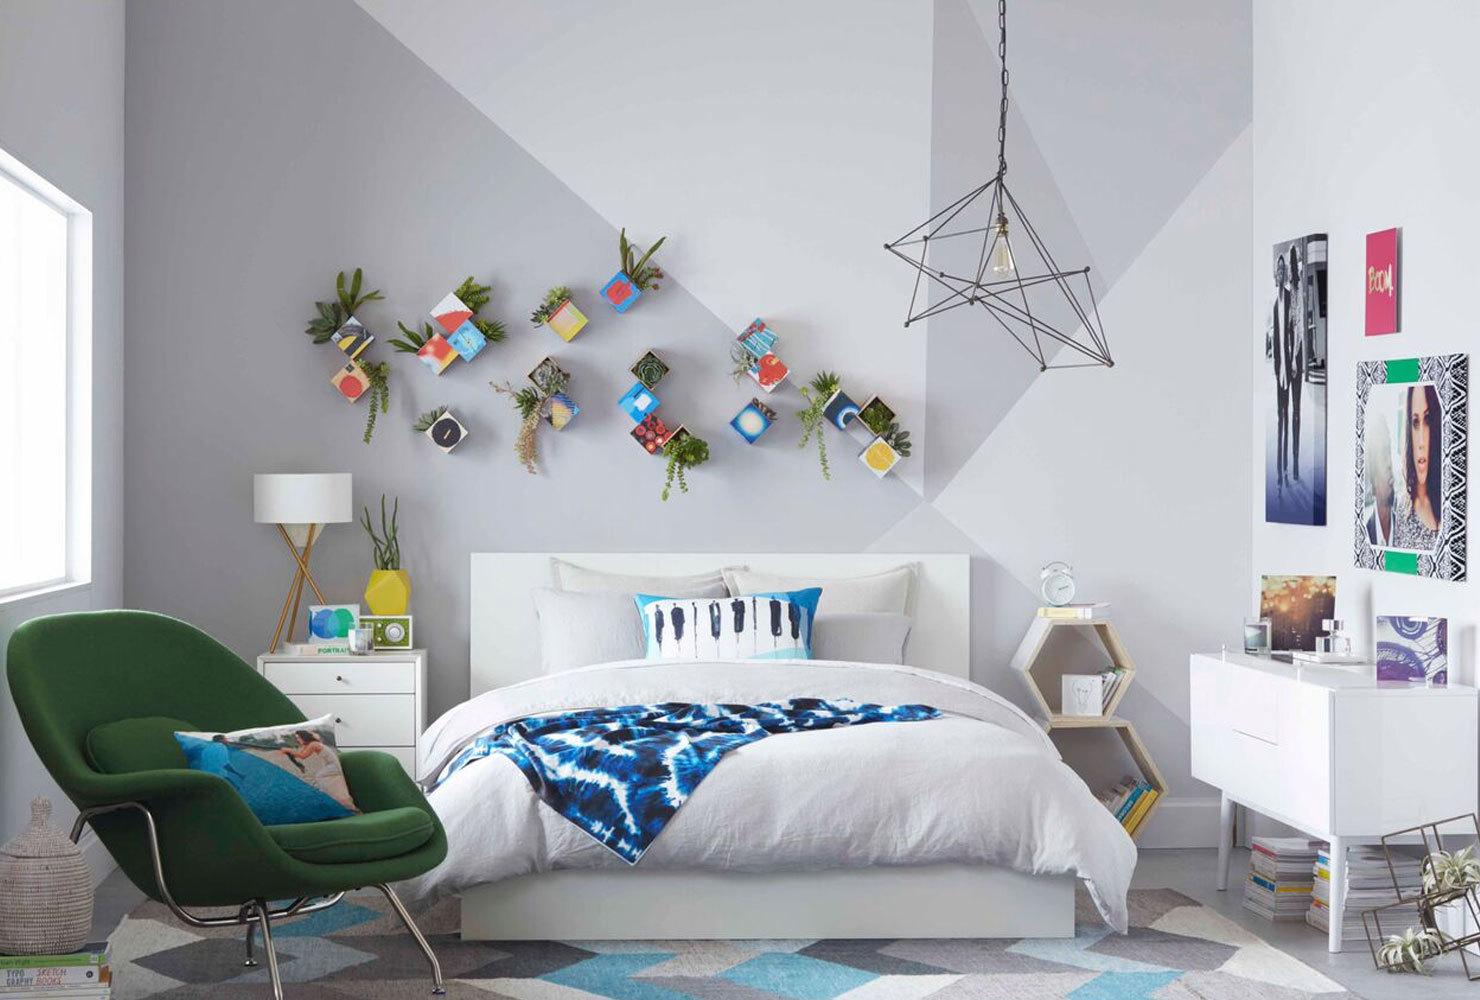 3 Wall Hanging planter ideas via Simphome